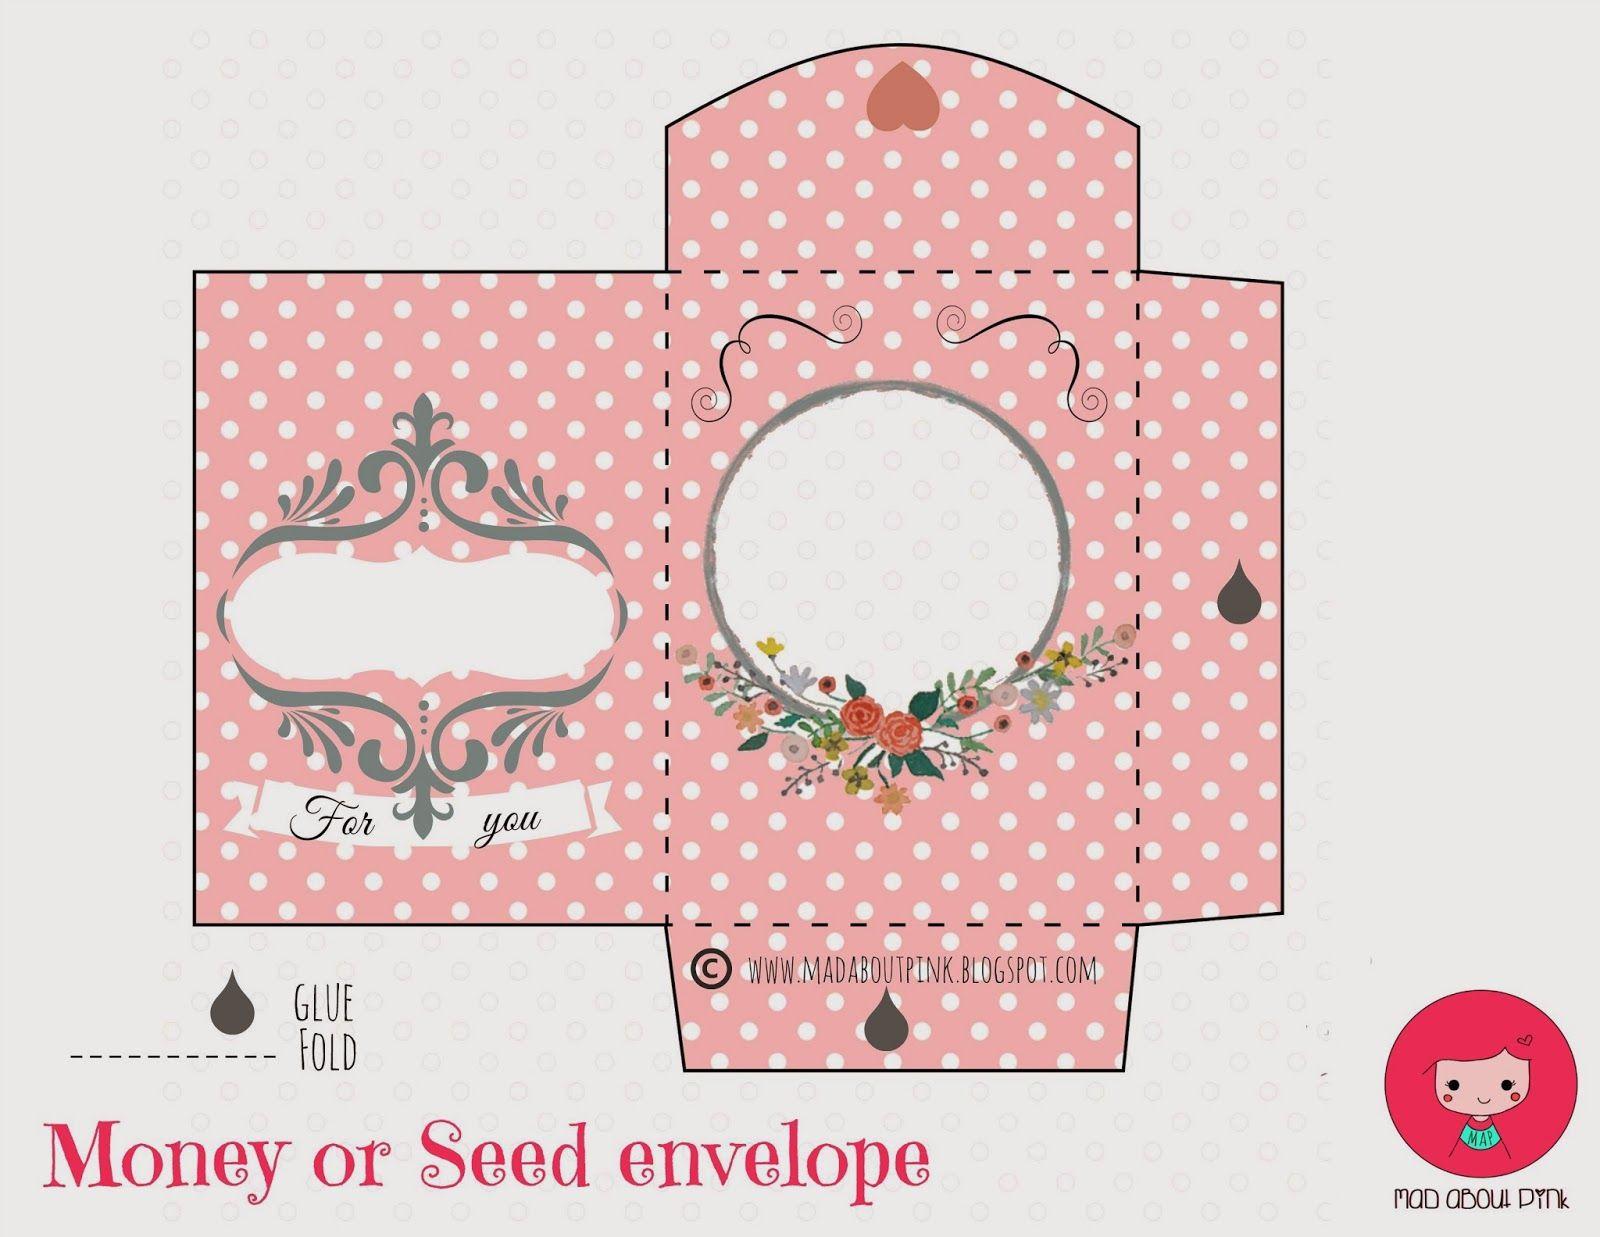 009 Astounding Gift Card Envelope Template Design  Templates Voucher Diy Free PrintableFull